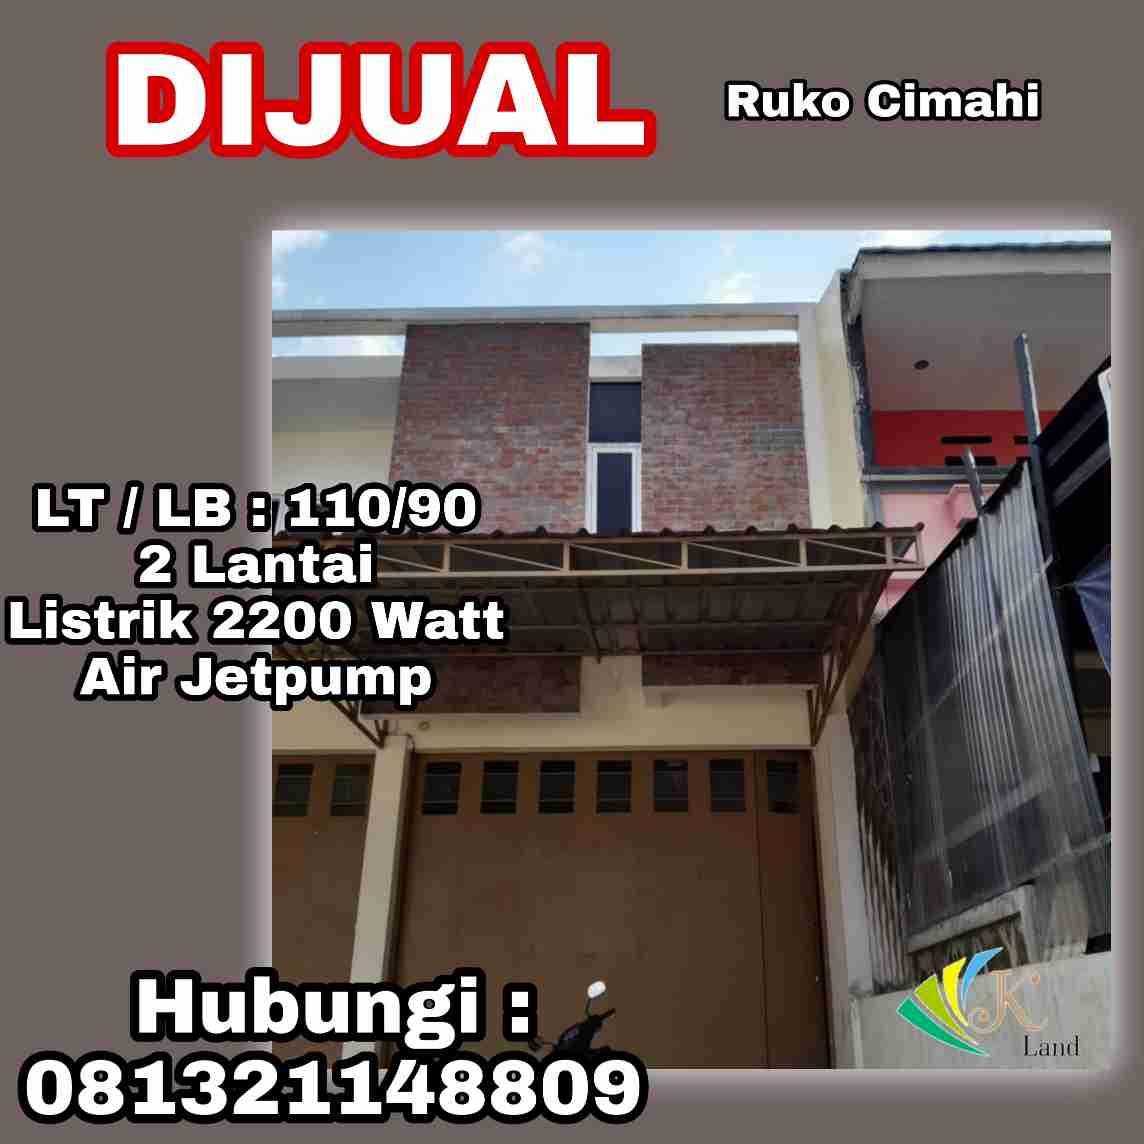 Dijual Ruko Strategis Bandung Cimahi